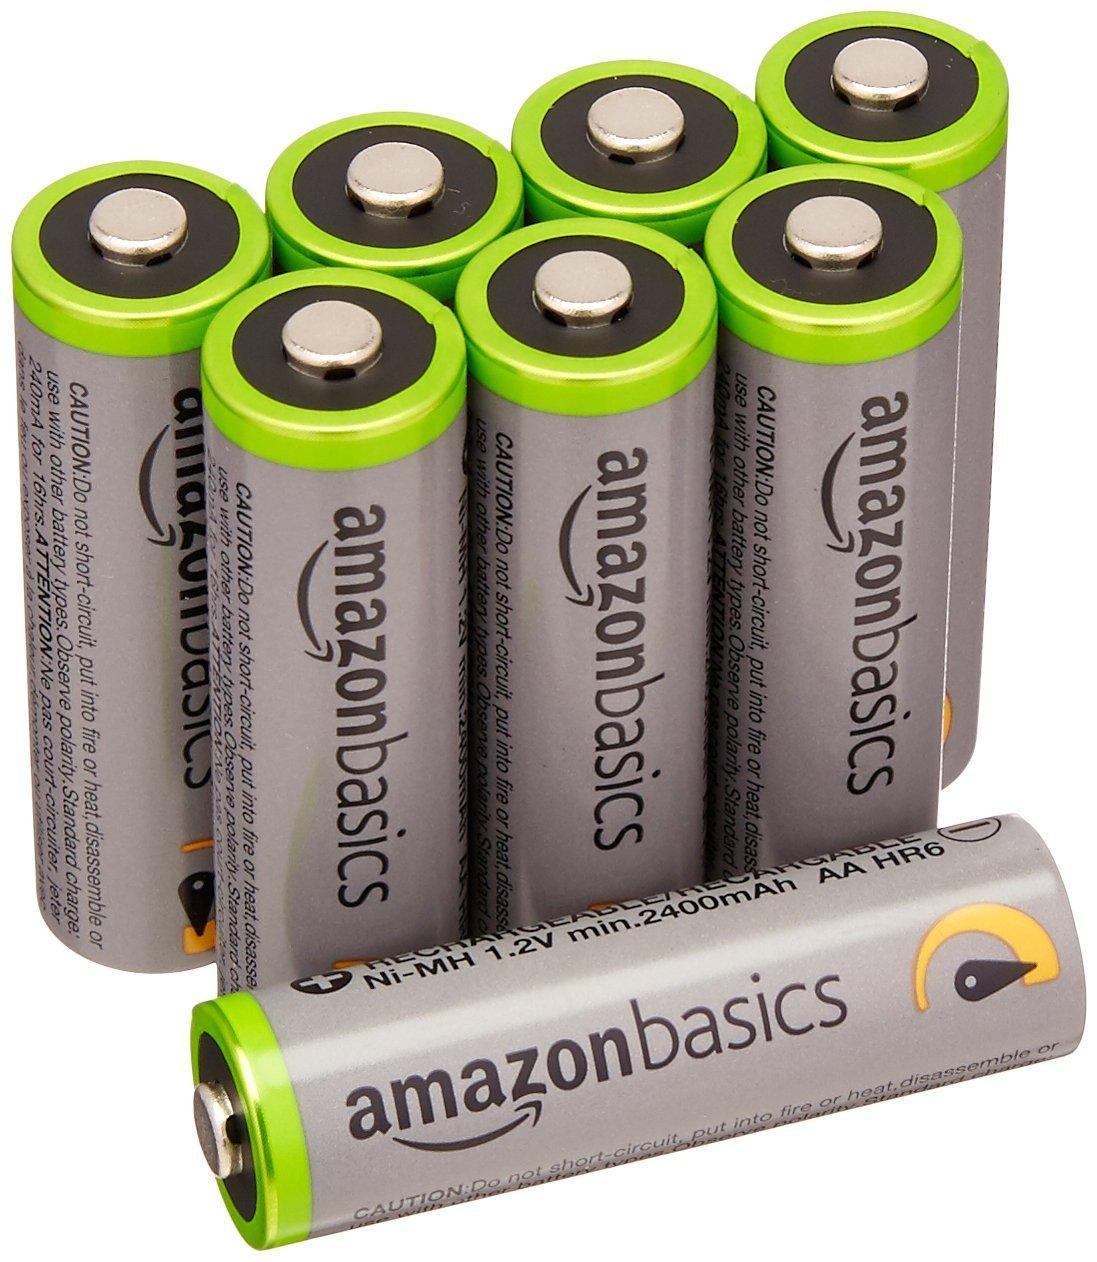 [Prime] Lot de 8 piles rechargeables AA AmazonBasics - 2400 mAh